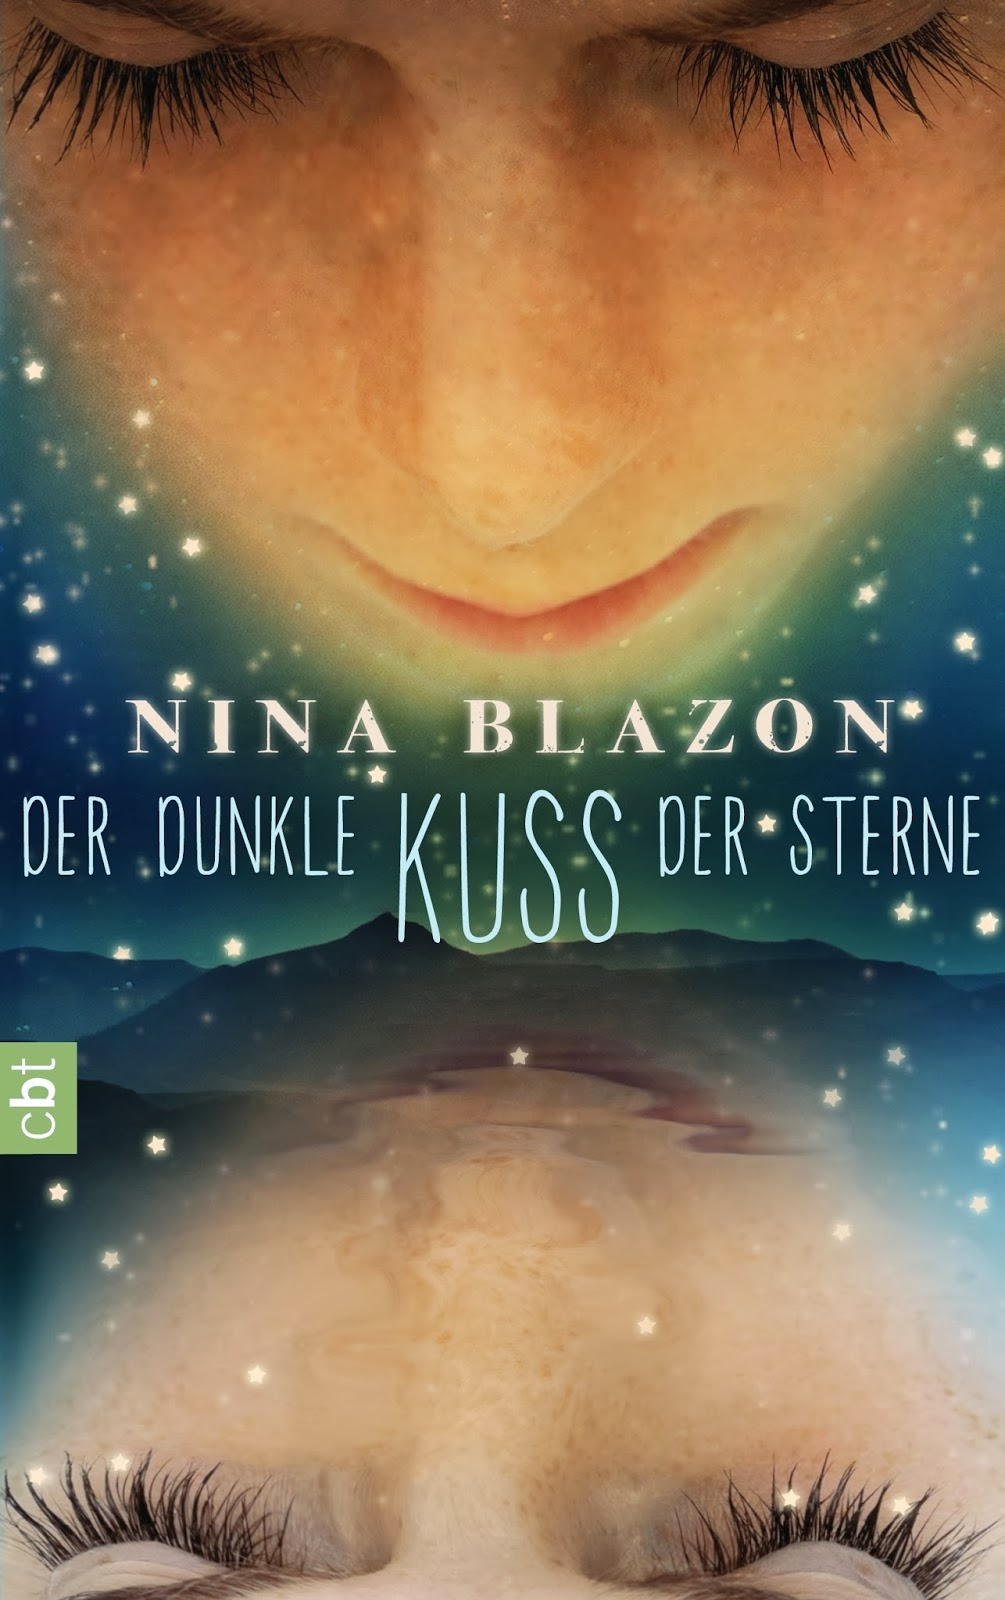 http://www.amazon.de/dunkle-Kuss-Sterne-Nina-Blazon/dp/3570161552/ref=sr_1_1?ie=UTF8&qid=1393676525&sr=8-1&keywords=der+dunkle+kuss+der+sterne